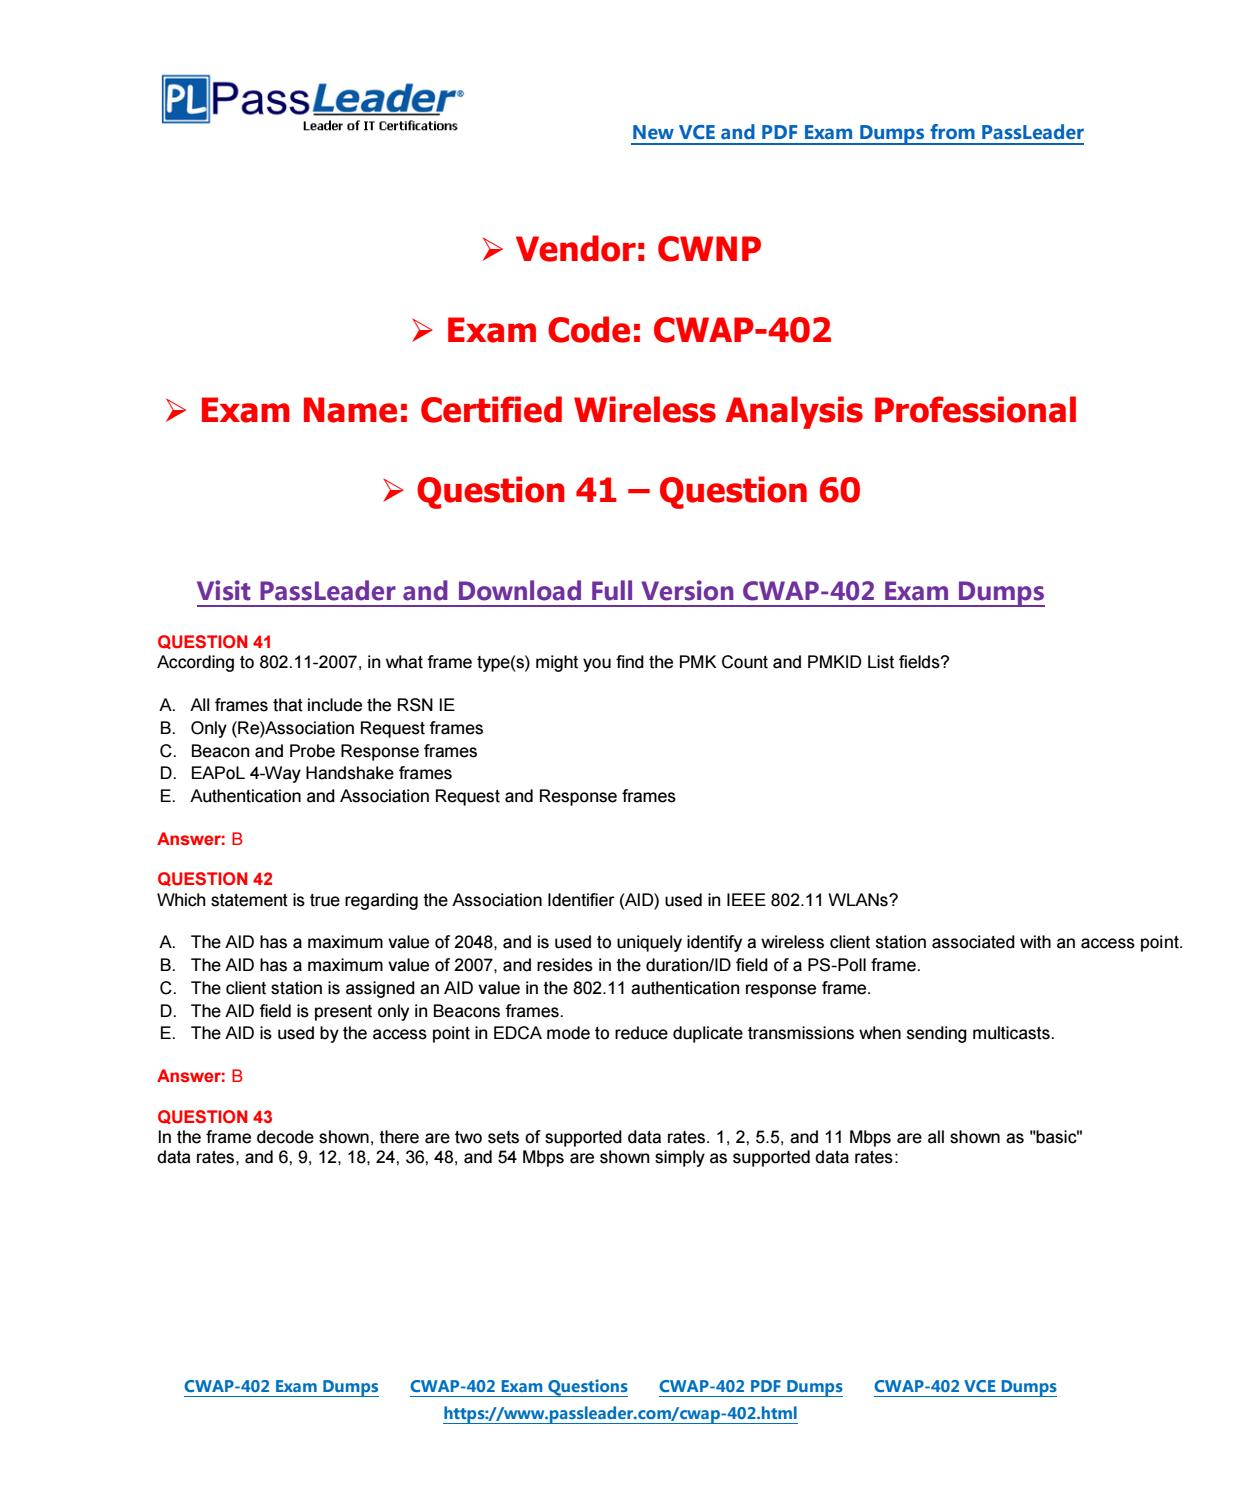 2018 New CWNP CWAP-402 Dumps with PDF and VCE (Question 41-Question ...